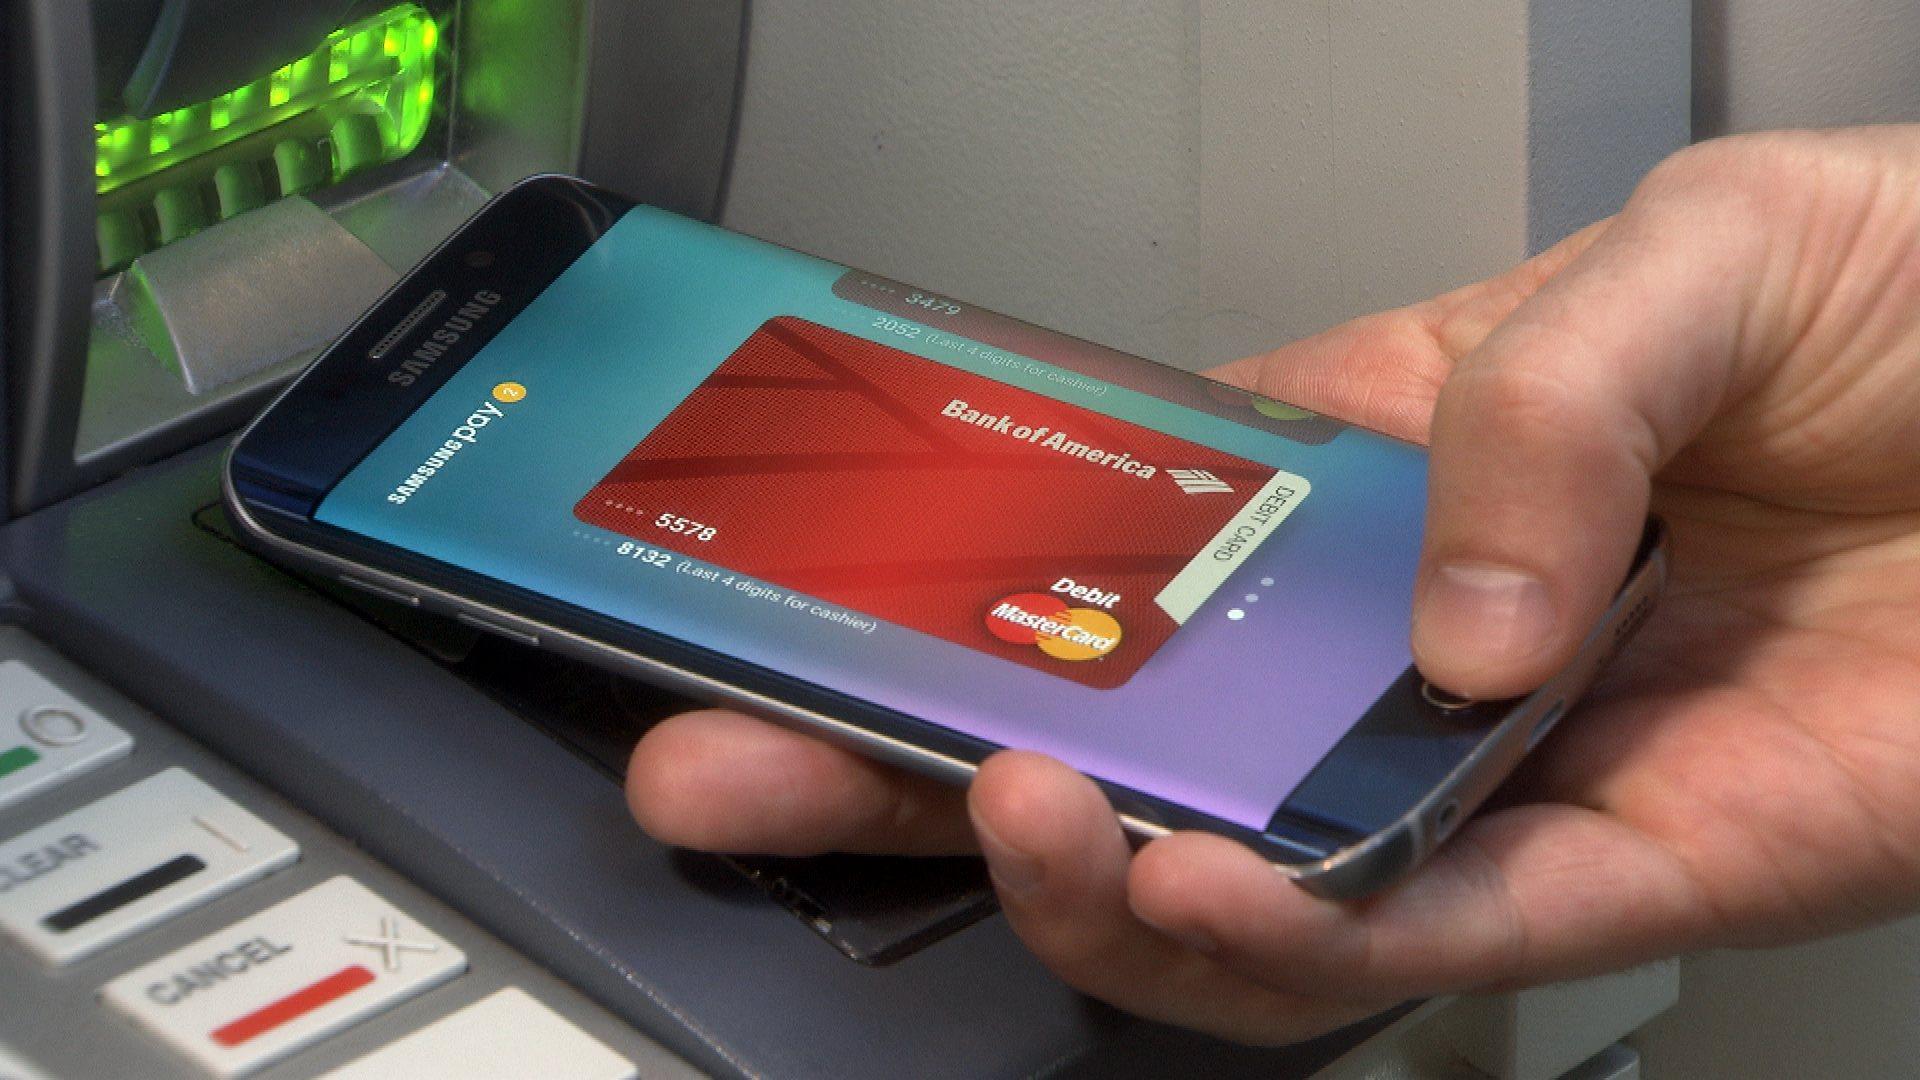 A consumer using a digital Bank of America debit card.